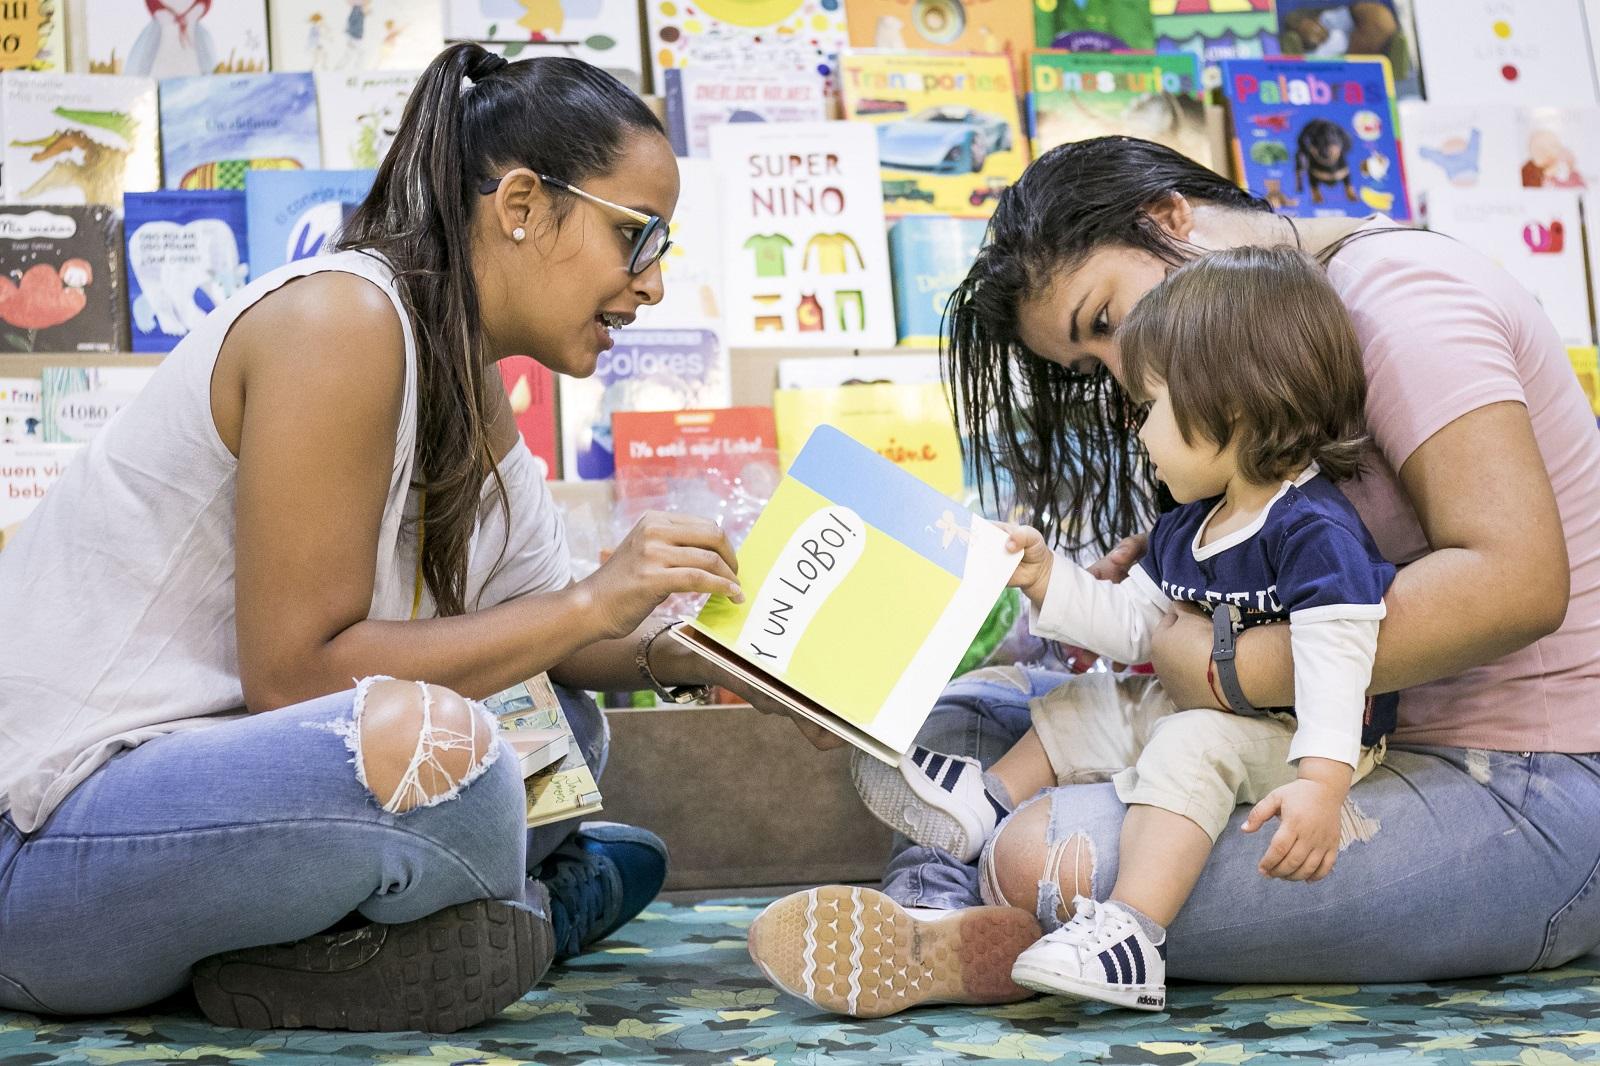 La poesía secreta de la literatura infantil